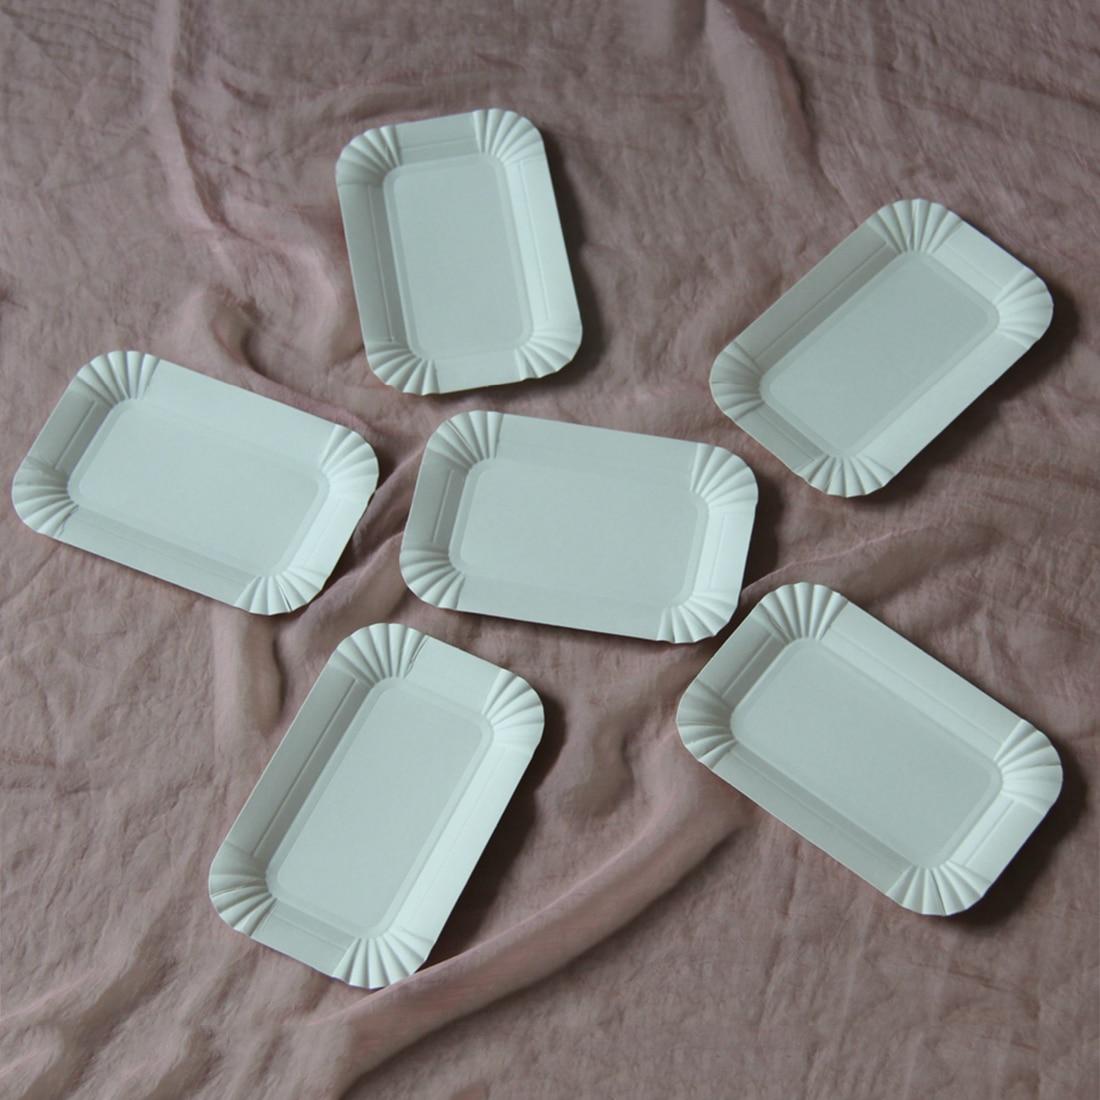 Hot selling 20Pcs Disposable paper plates Rectangular ...